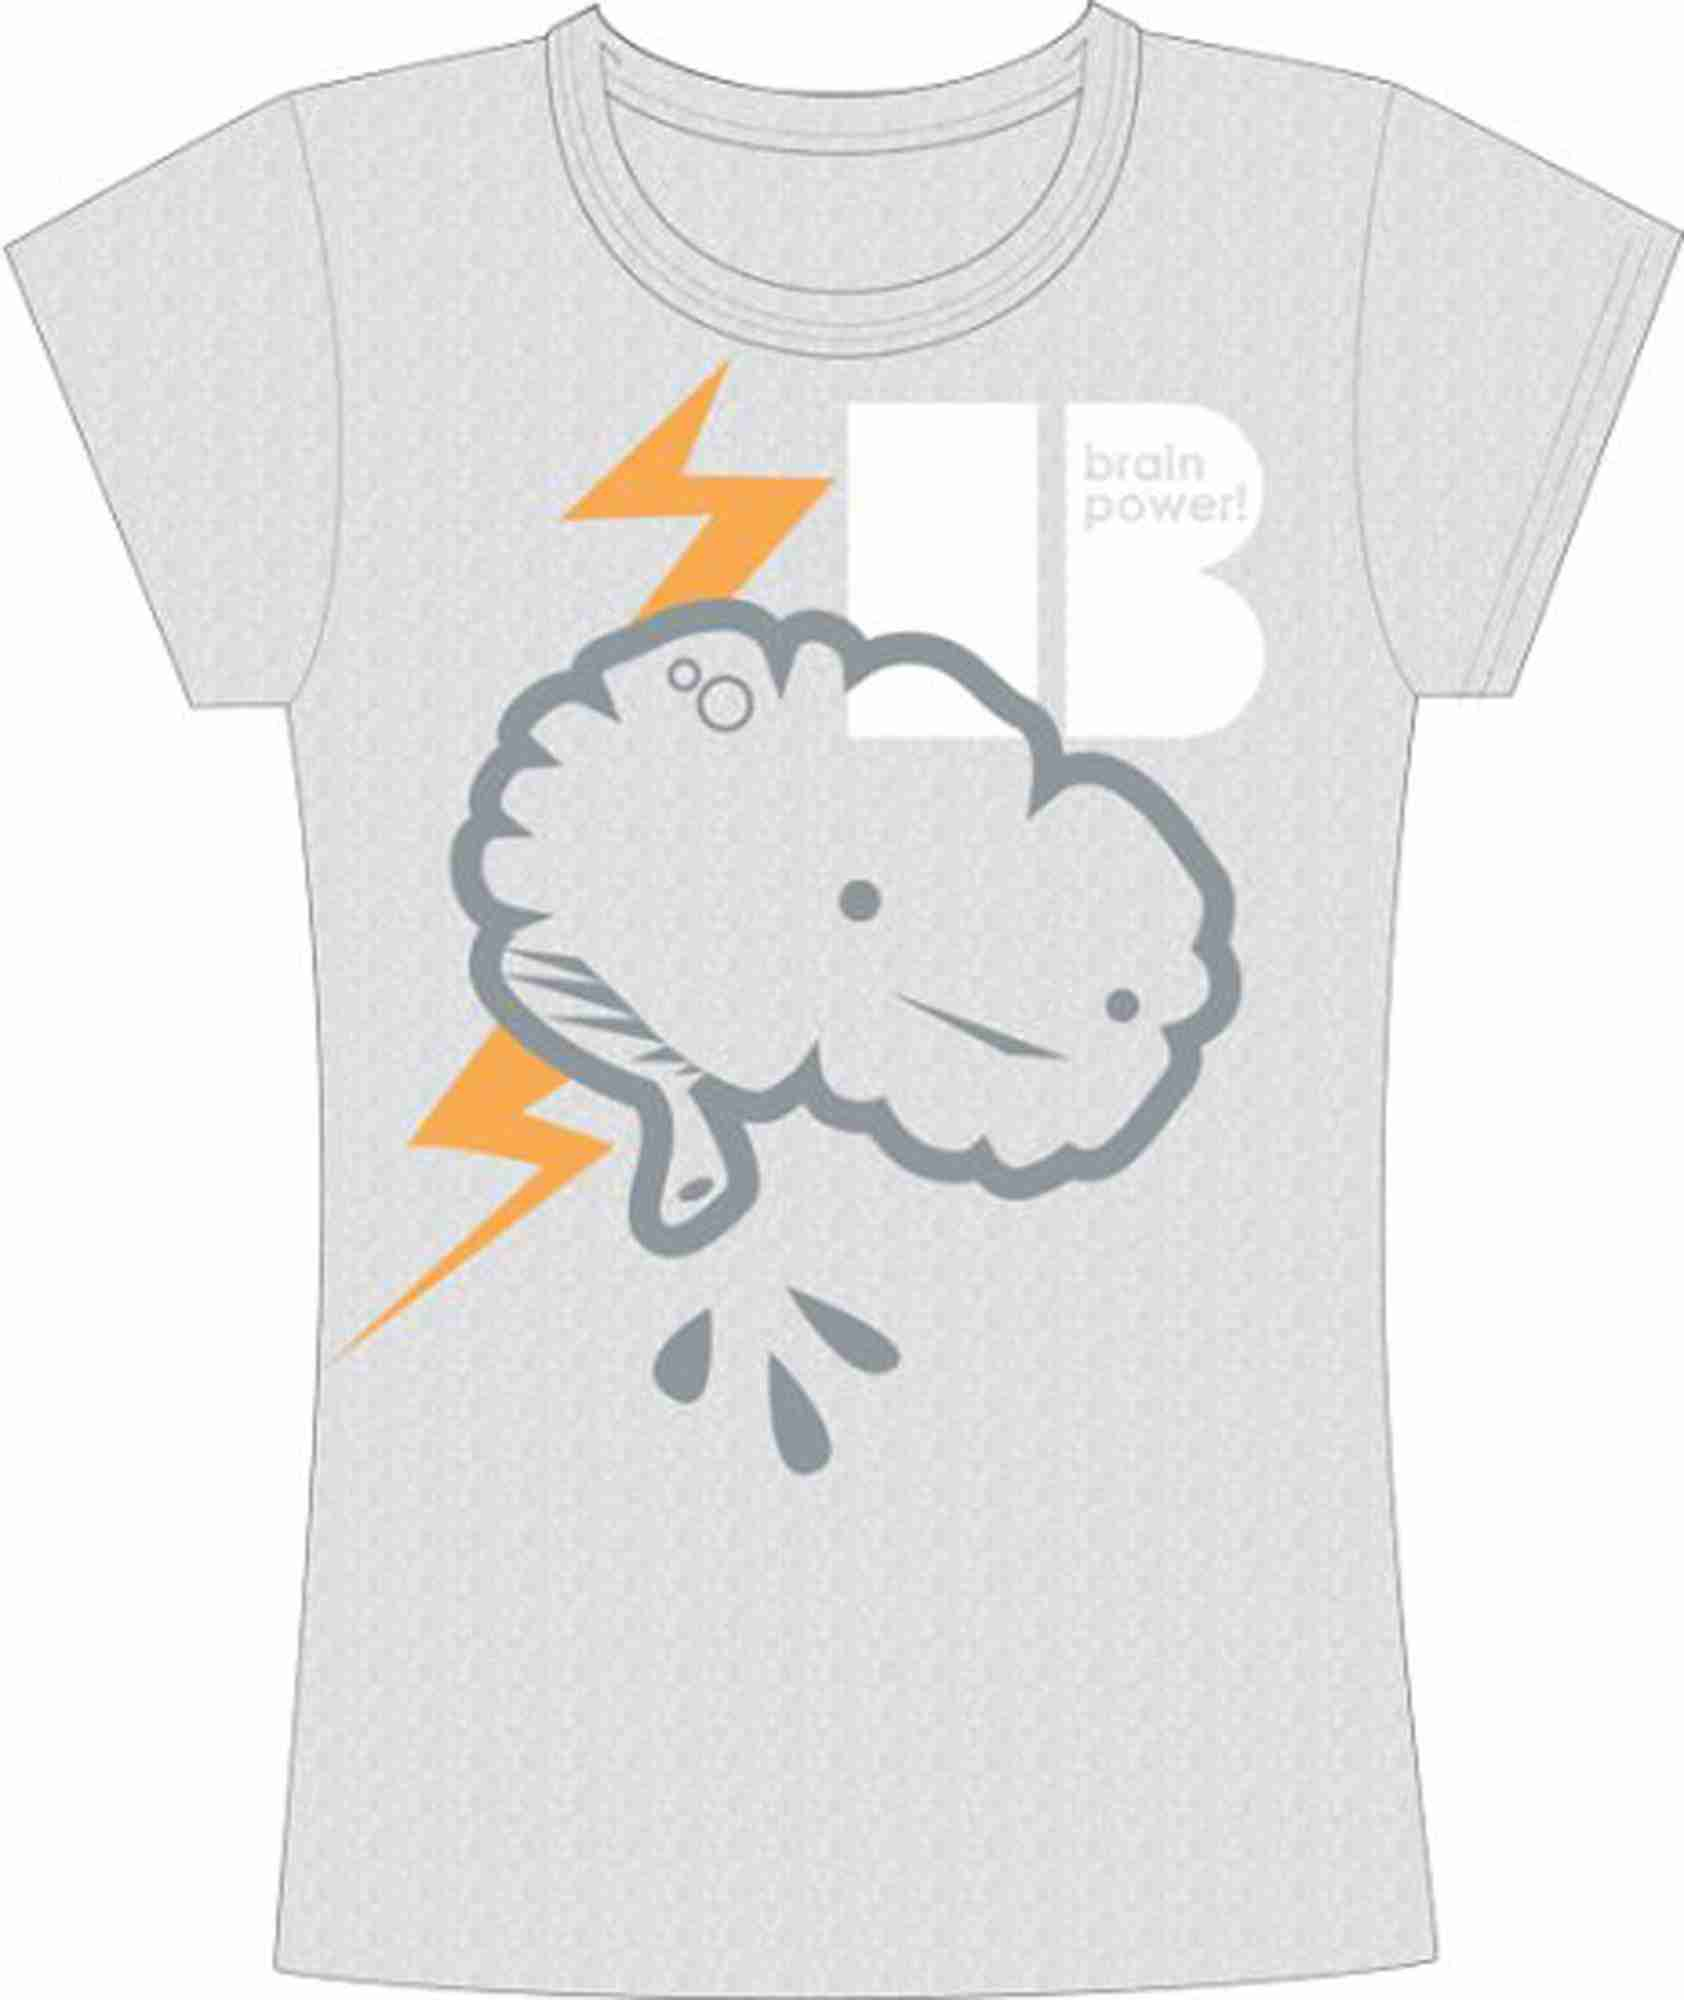 Brain Power Tshirt By I Heart Guts